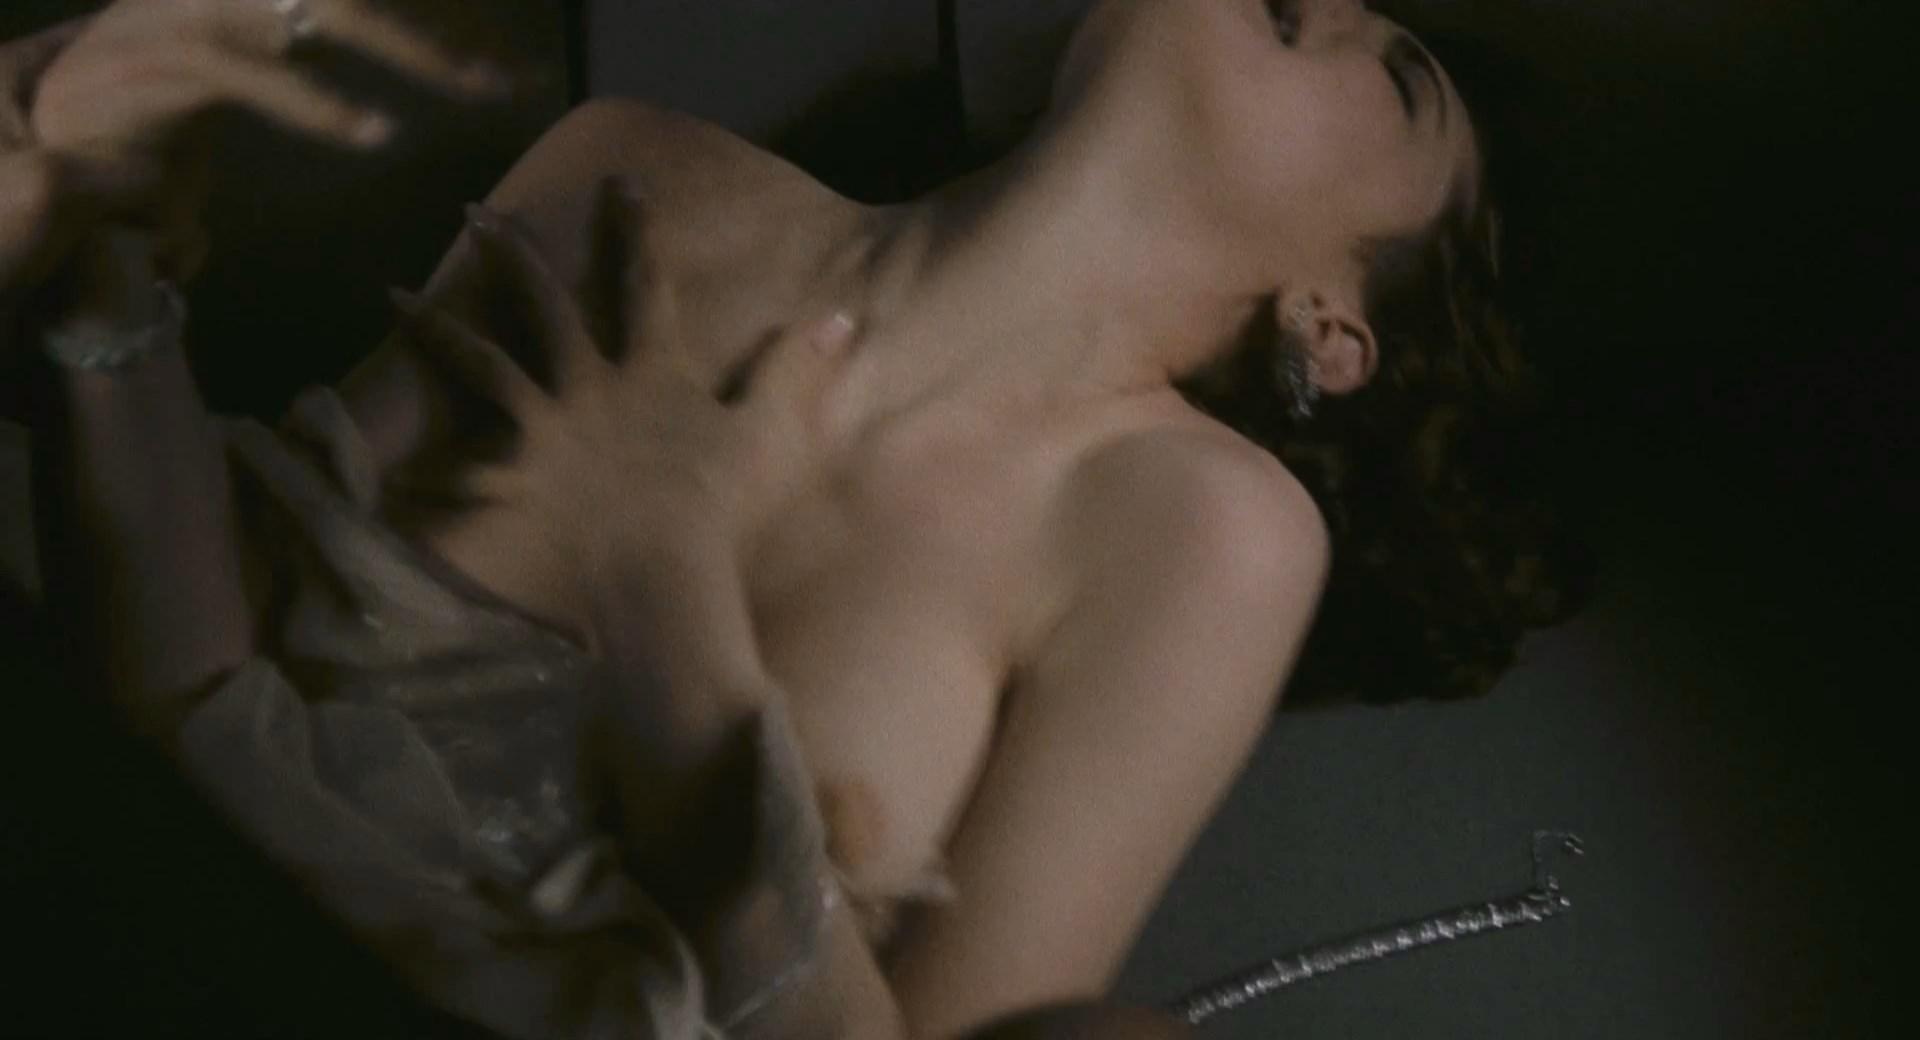 Porn pictures elizabeth mcgovern sex tape